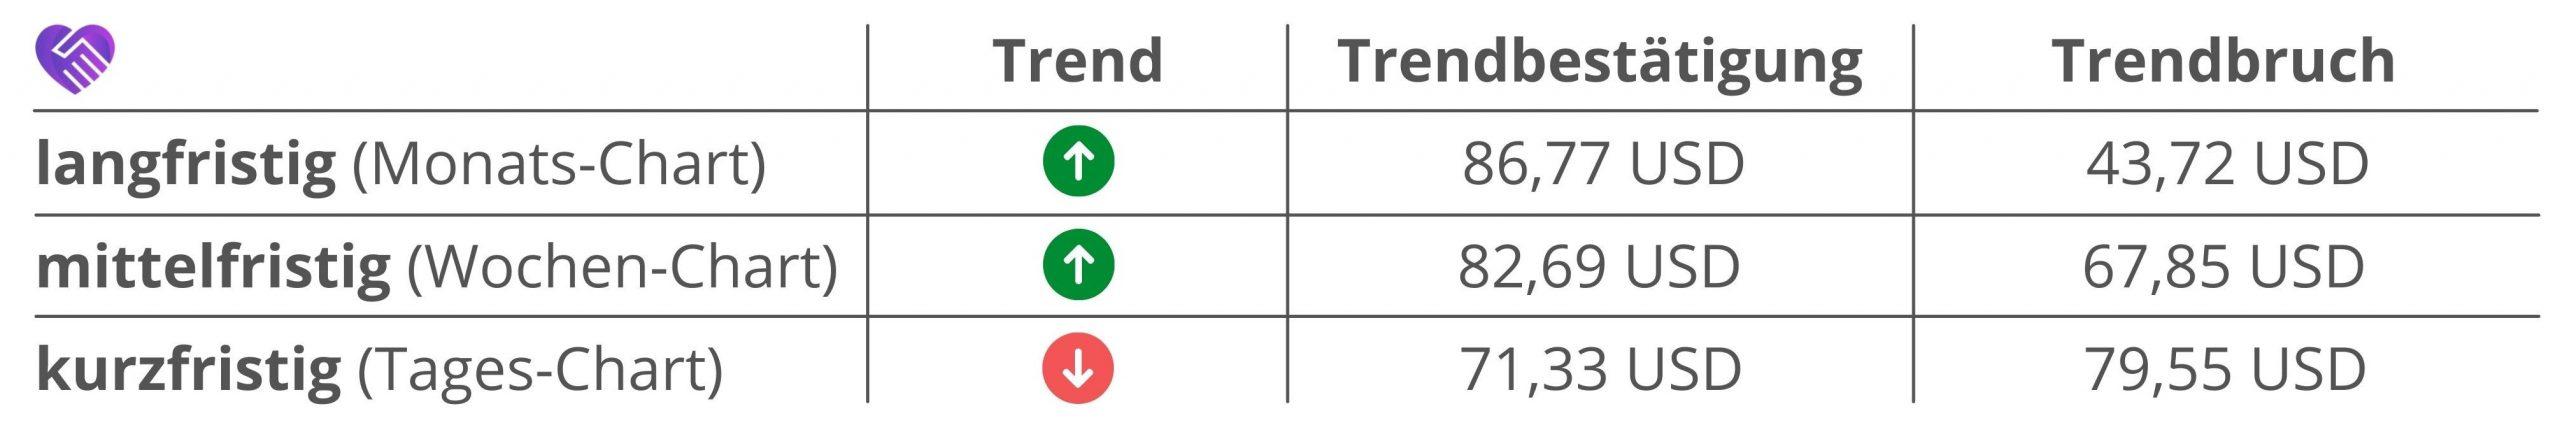 CyrusOne Aktie Analyse Trends